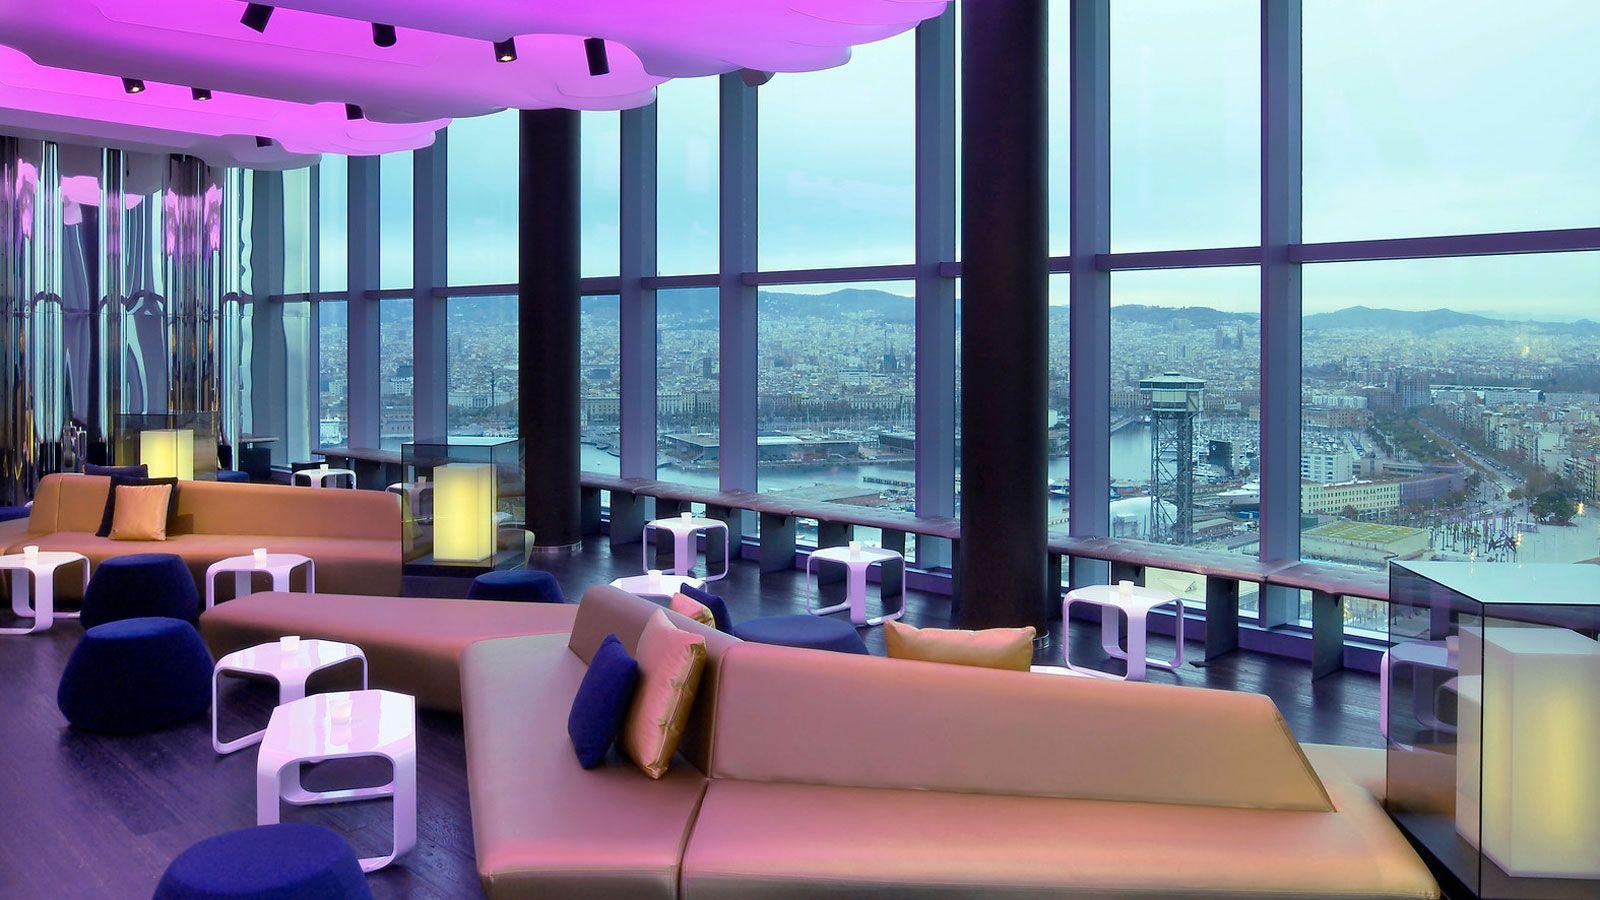 The W Hotel In Barcelona By Ricardo Bofill Architecture Design Barcelona Hotels Hotel Destination Wedding Resort